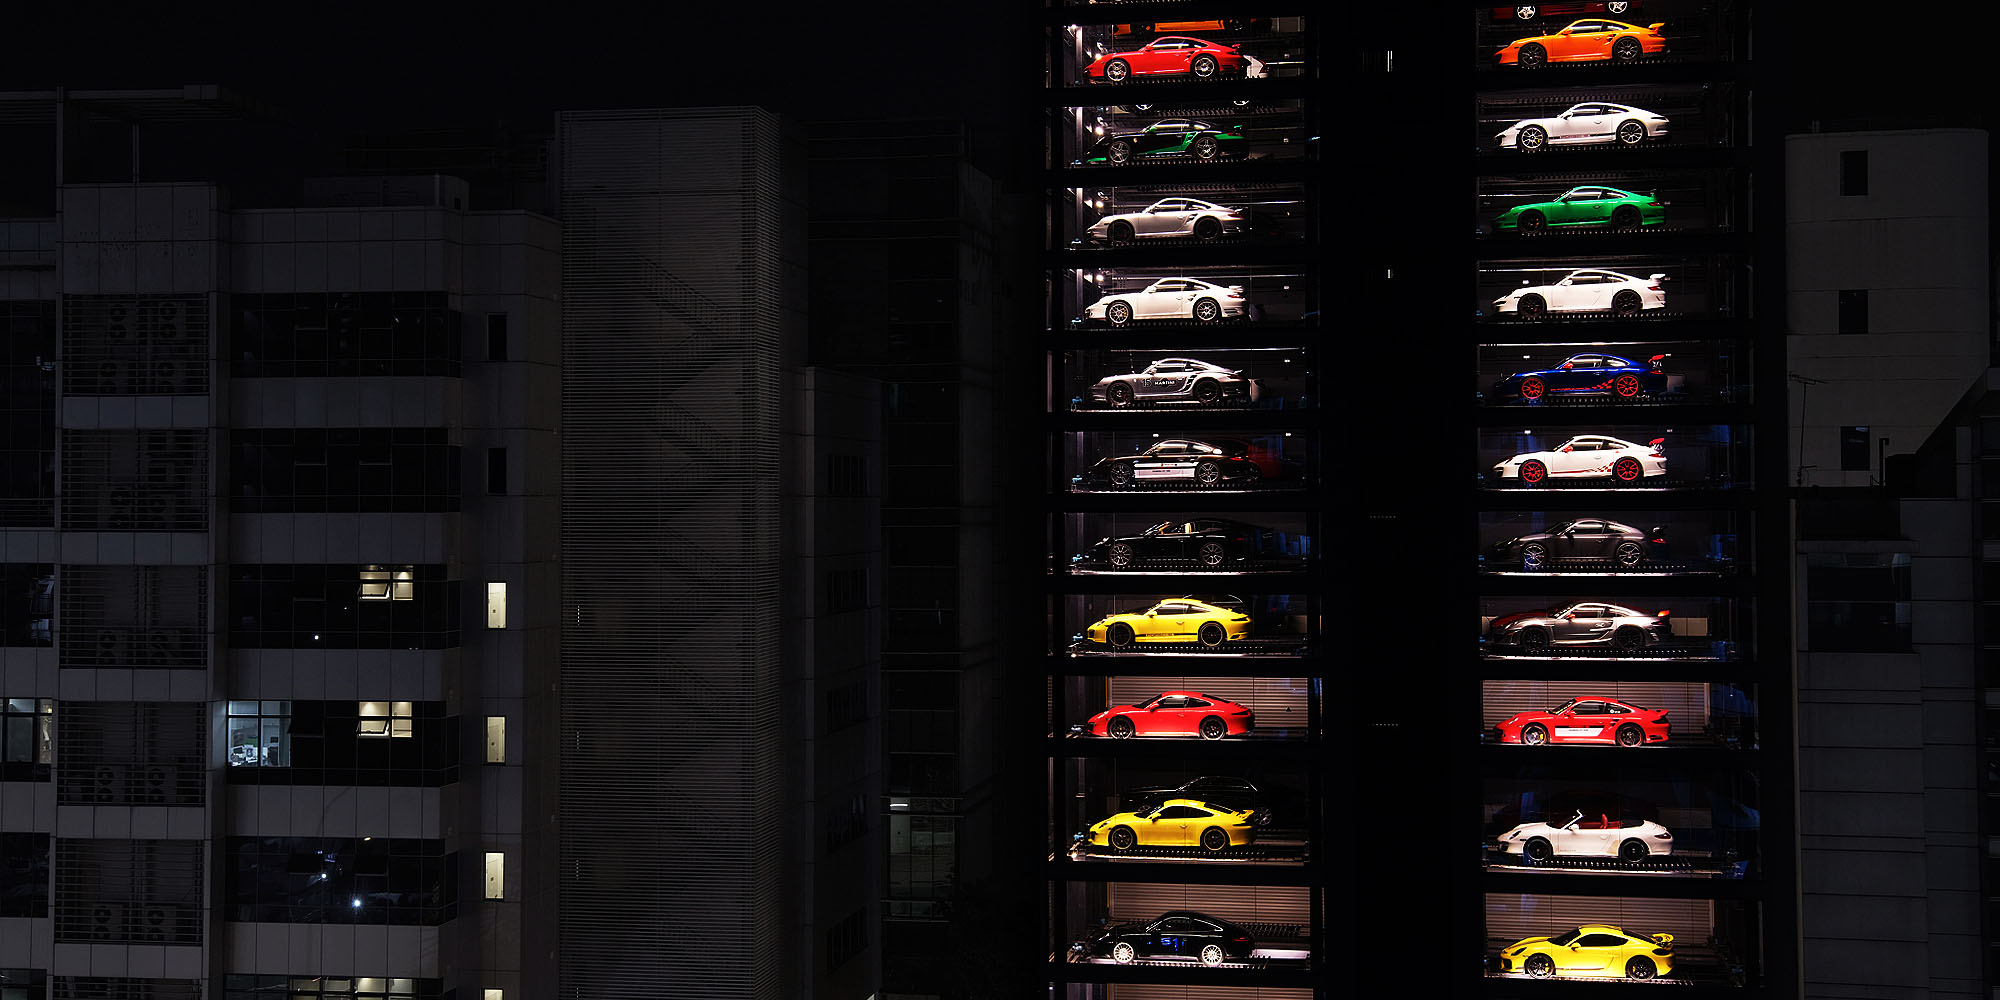 autobahn motors - vending machine - elle man 4